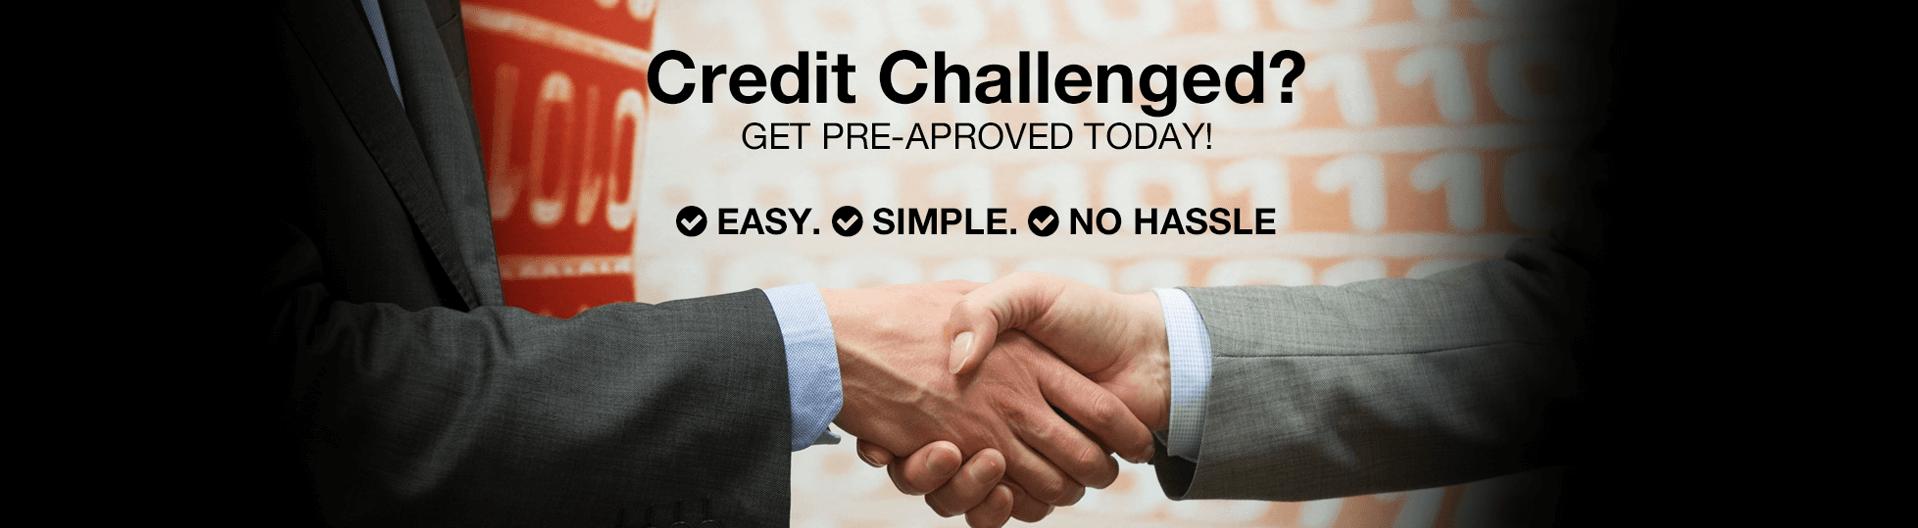 Credit Challenged